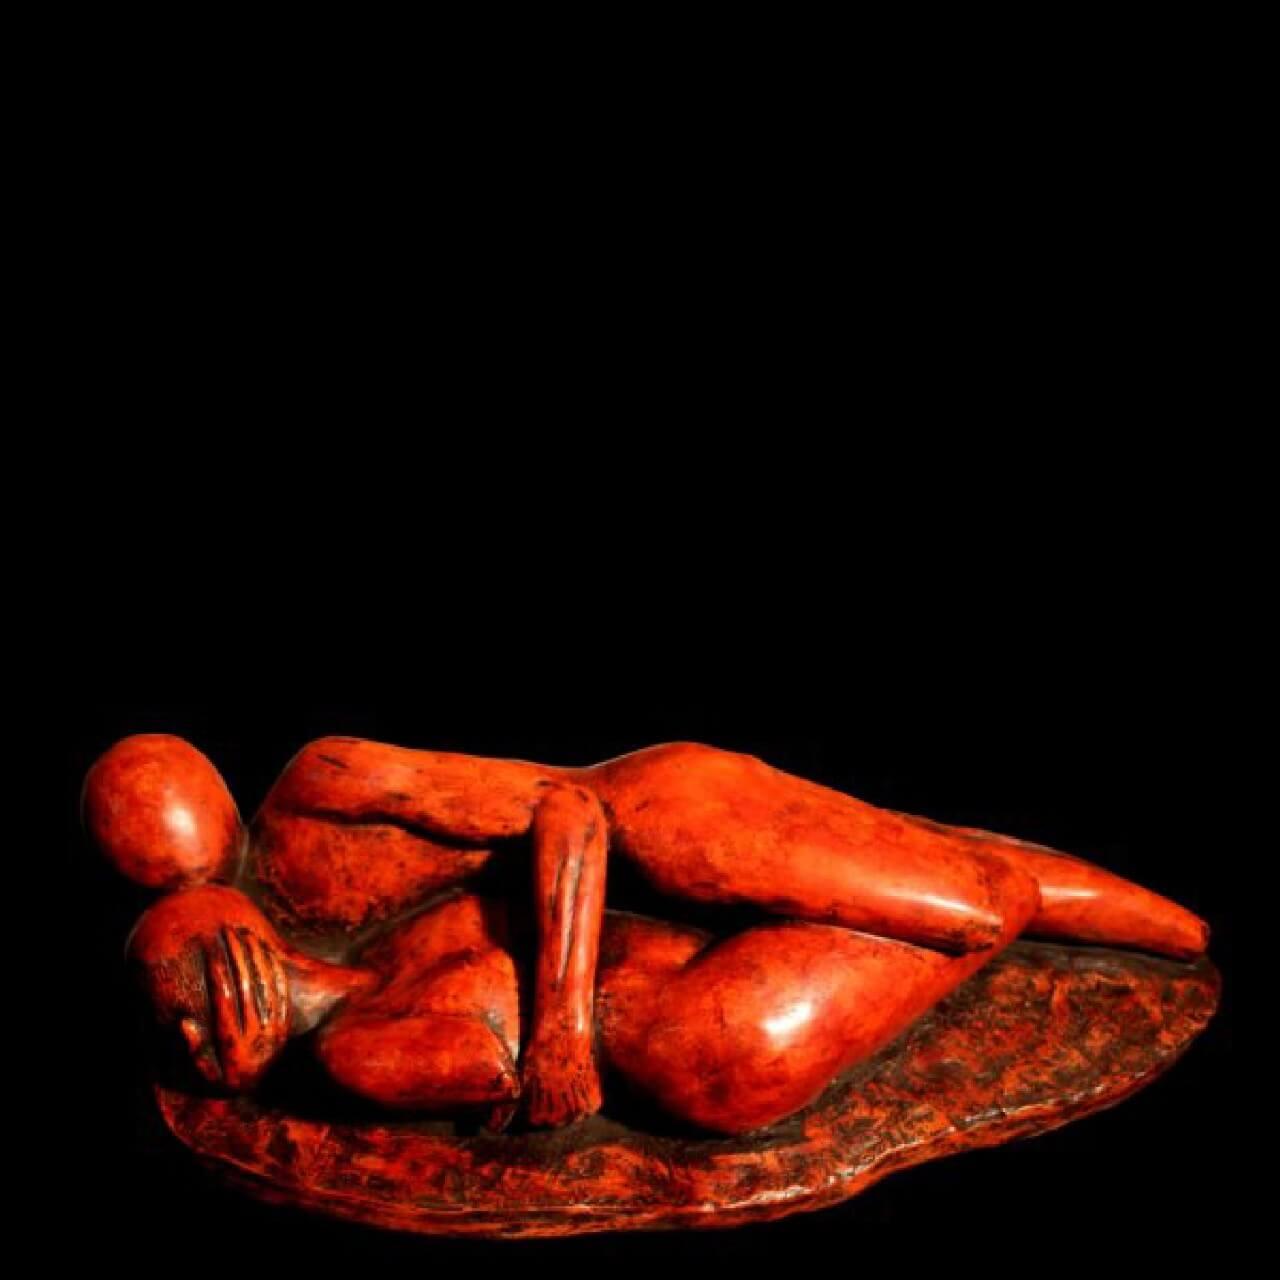 mario pavesi italian sculptur painter bronze reclined figure